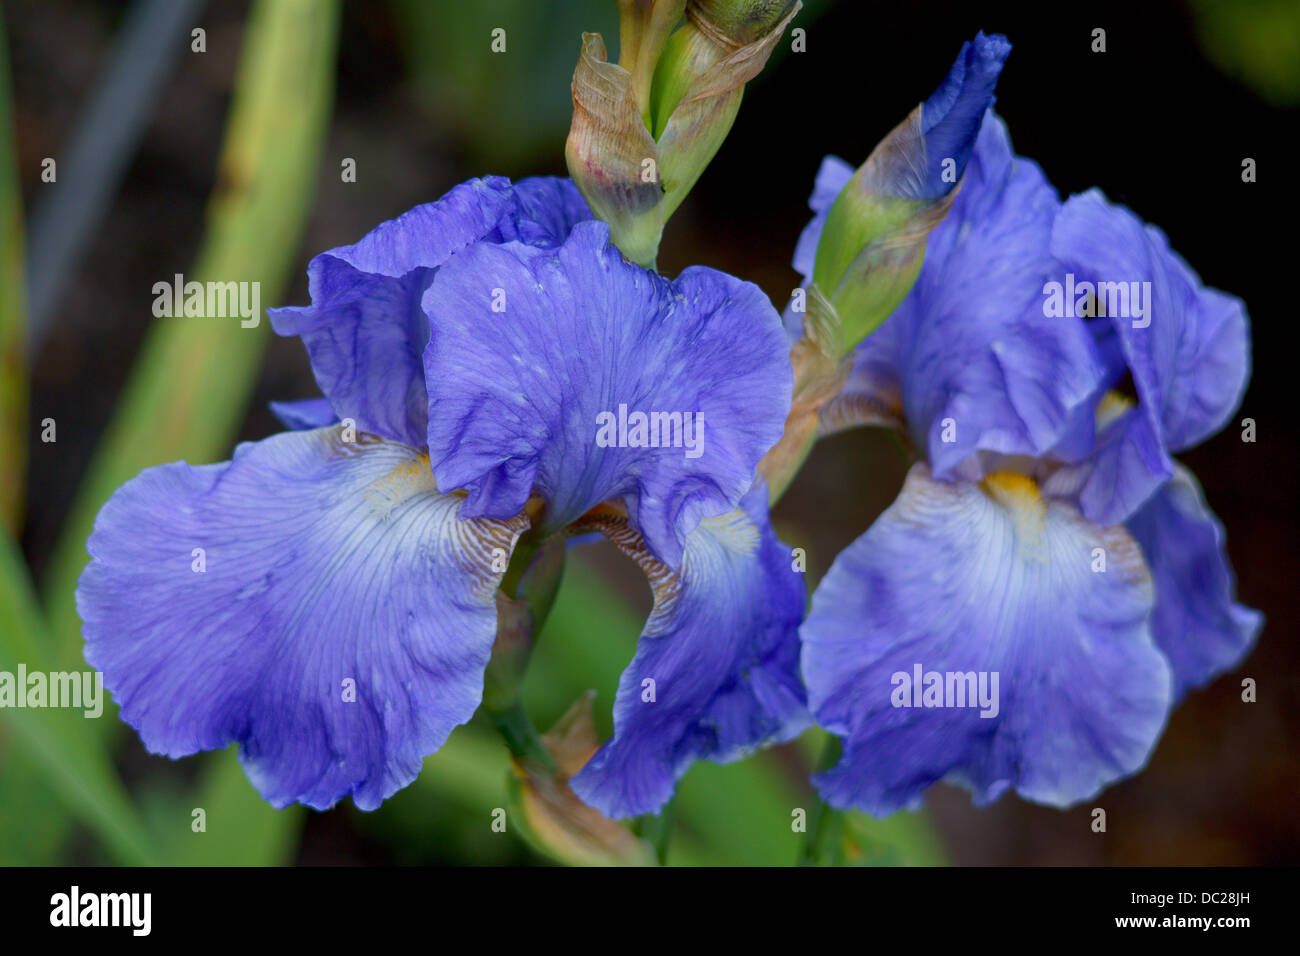 Two Blue Iris Flower Flowers Stock Photos Two Blue Iris Flower